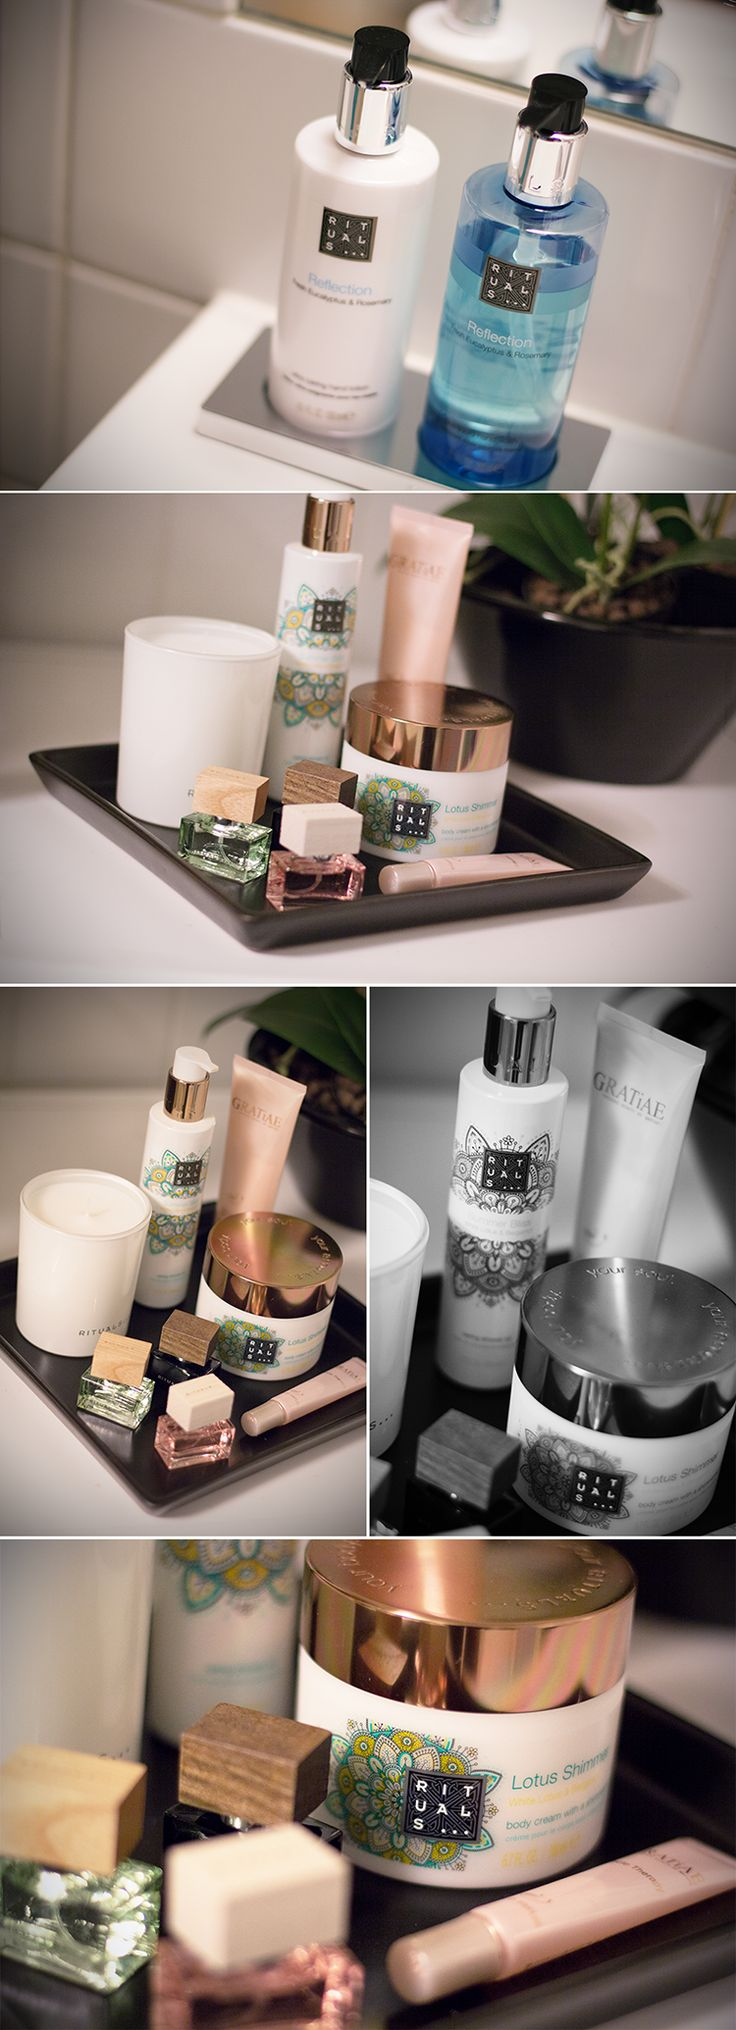 Badezimmer, Dekoration - Tablett - Rituals Cosmetics. Rituals. Skincare. Soap. Bathroom. Decoration.